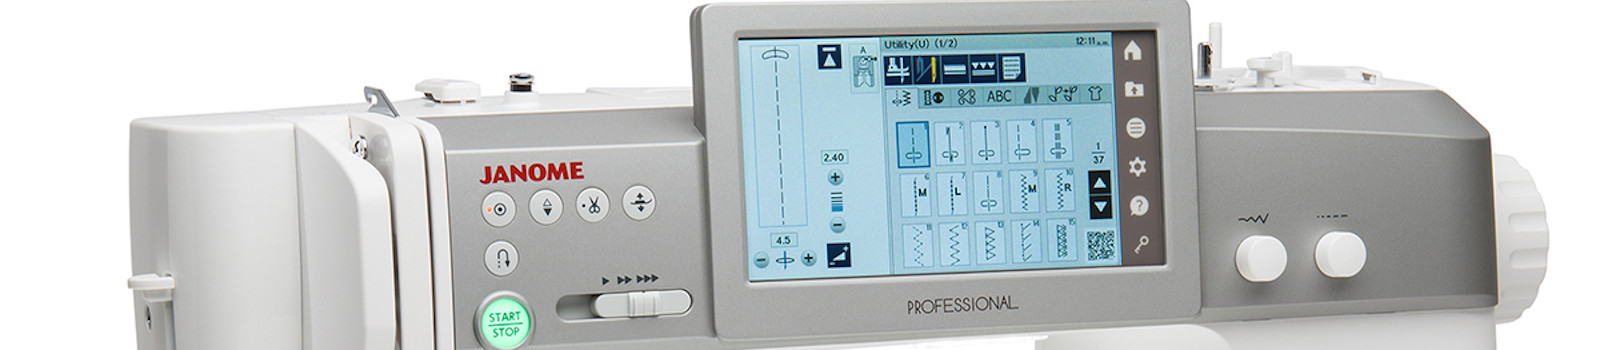 Janome M7 Professional Embroidery Machine